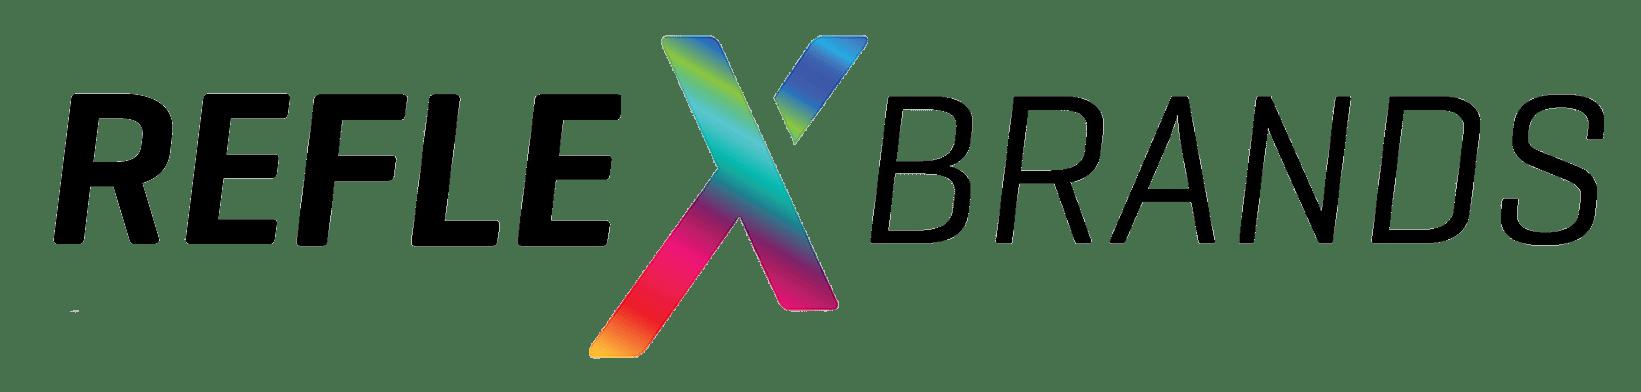 Reflex Brands Online Marketing Design Company Logo